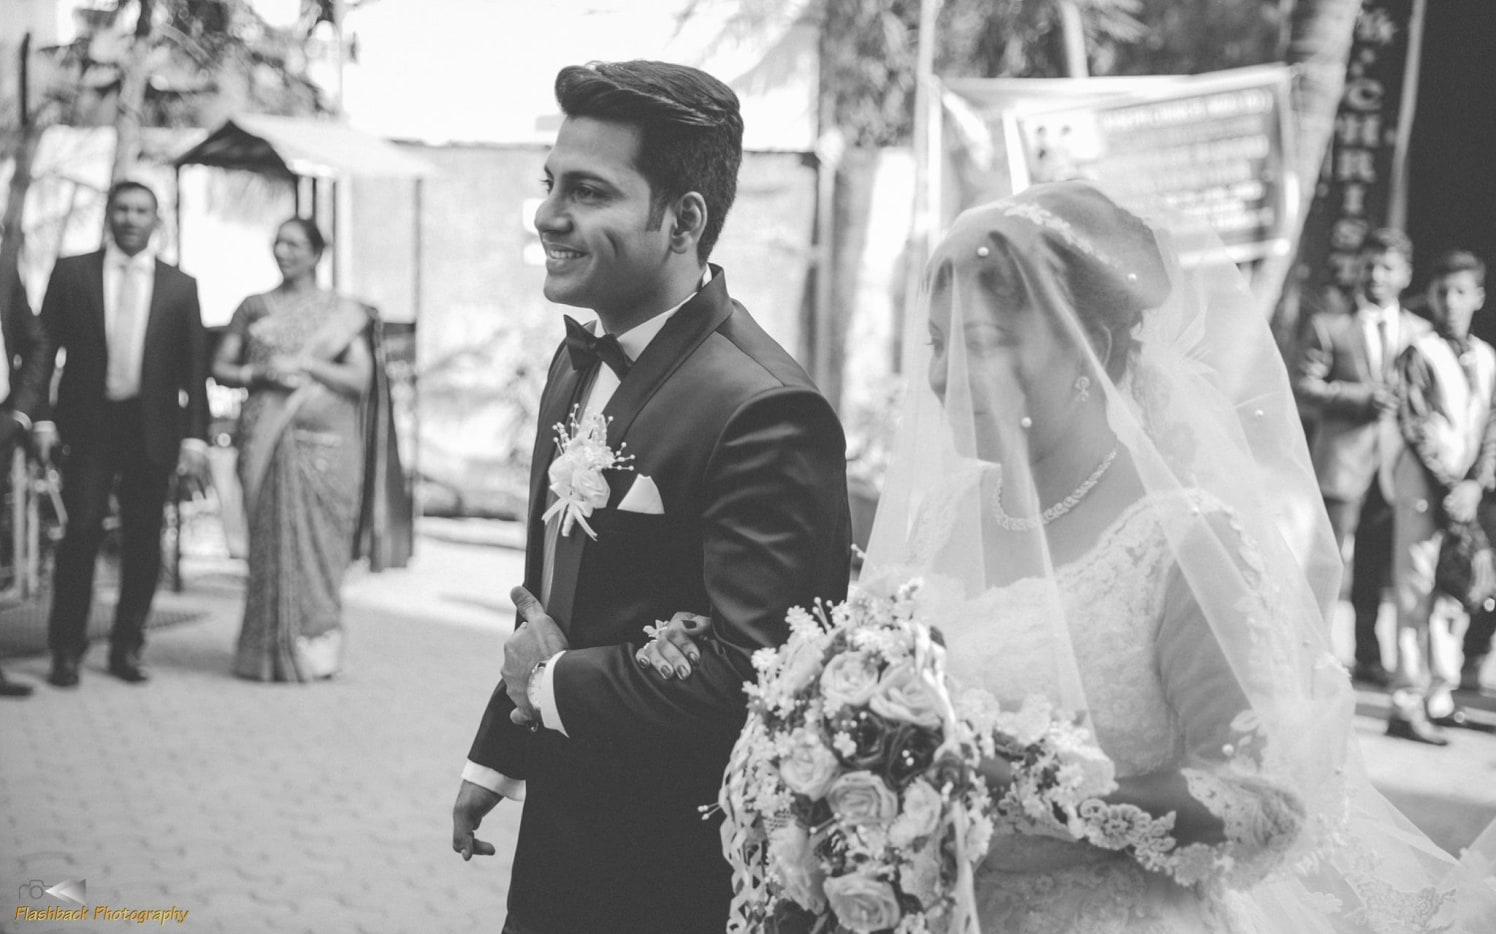 Christian Bride and Groom Making a Grand Entry by Lloyd Bangera Wedding-photography | Weddings Photos & Ideas